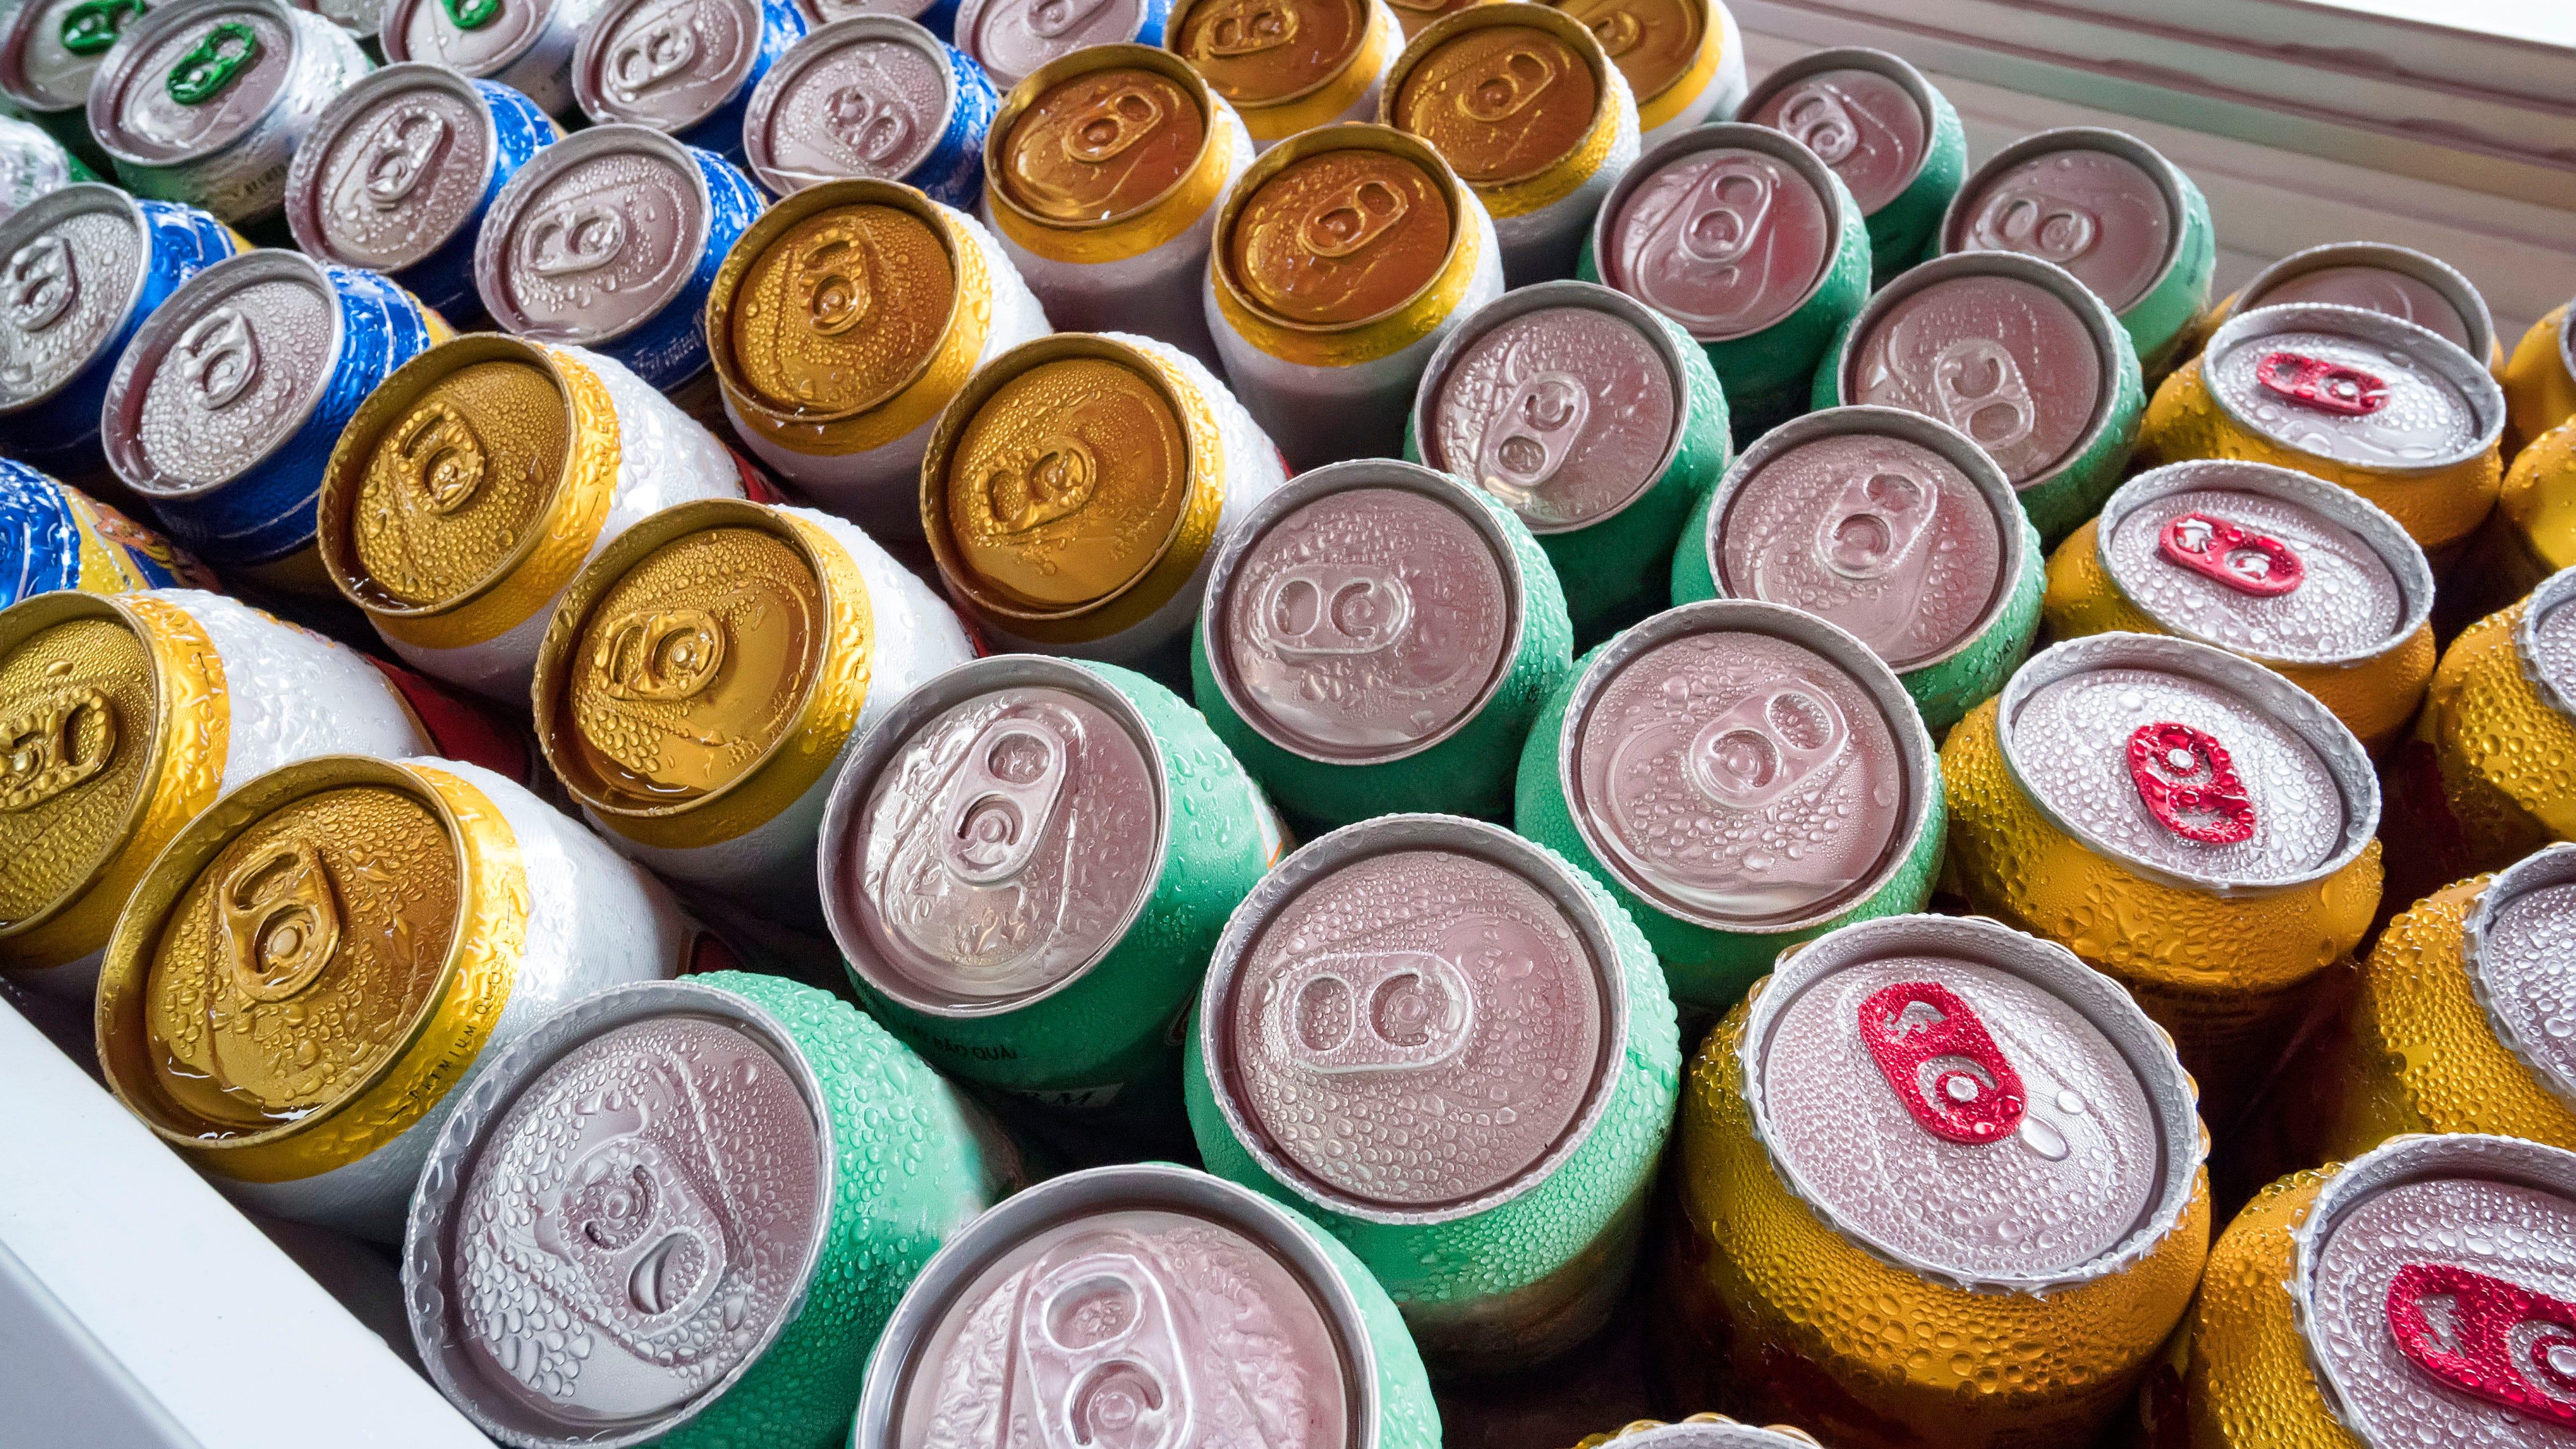 Major beer distributor comes to bars and restaurants' aid during coronavirus shutdowns